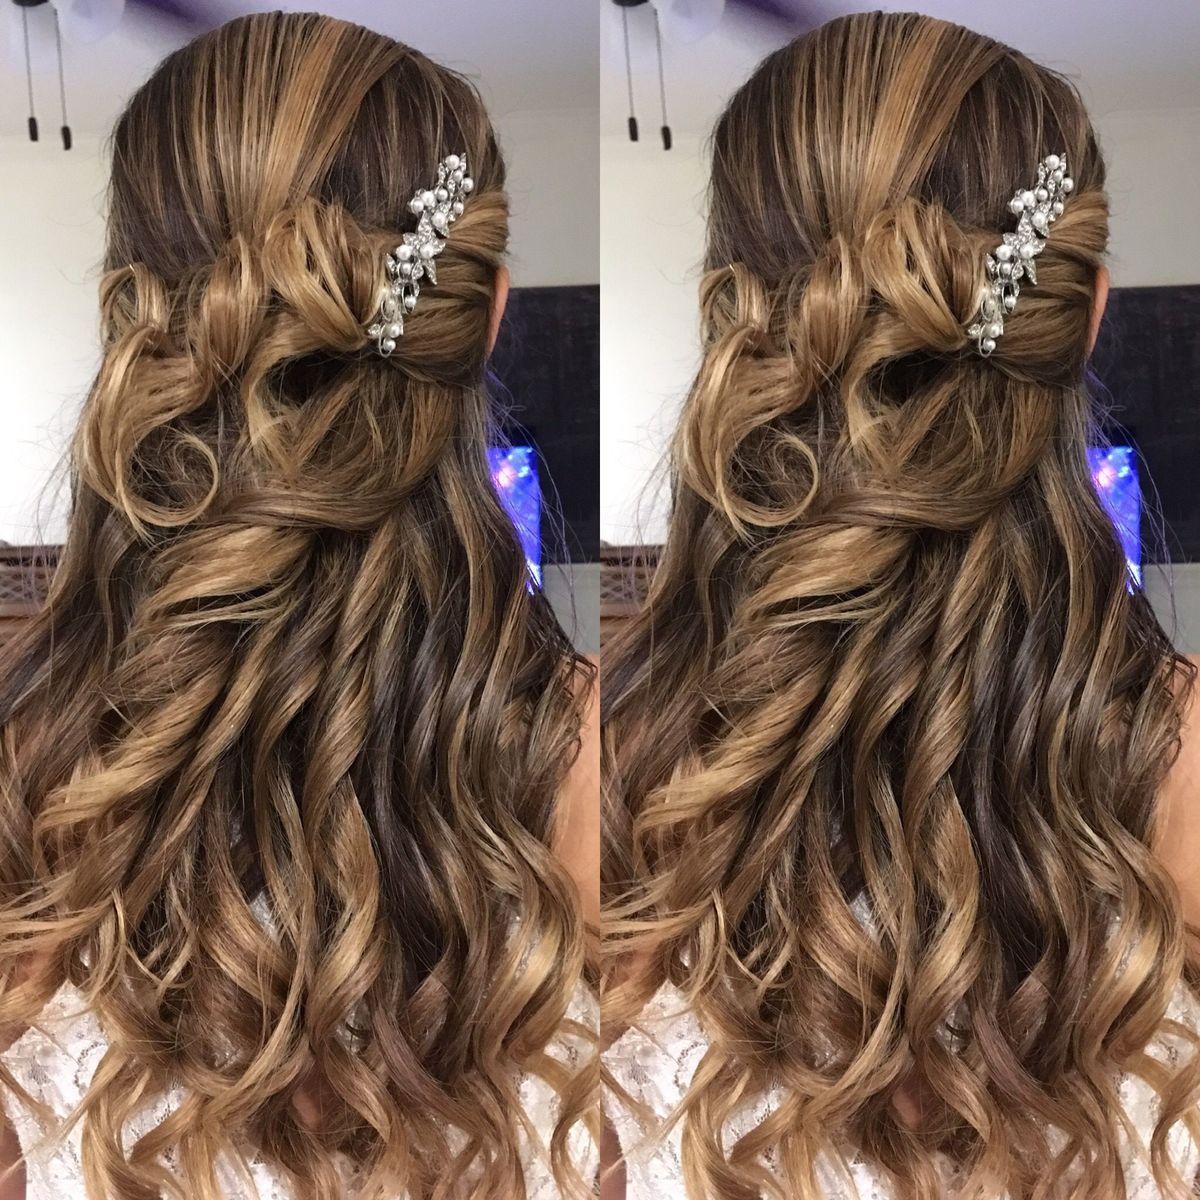 Hair Make Up By Jeanninemm Llc Beauty Health Tallahassee Fl